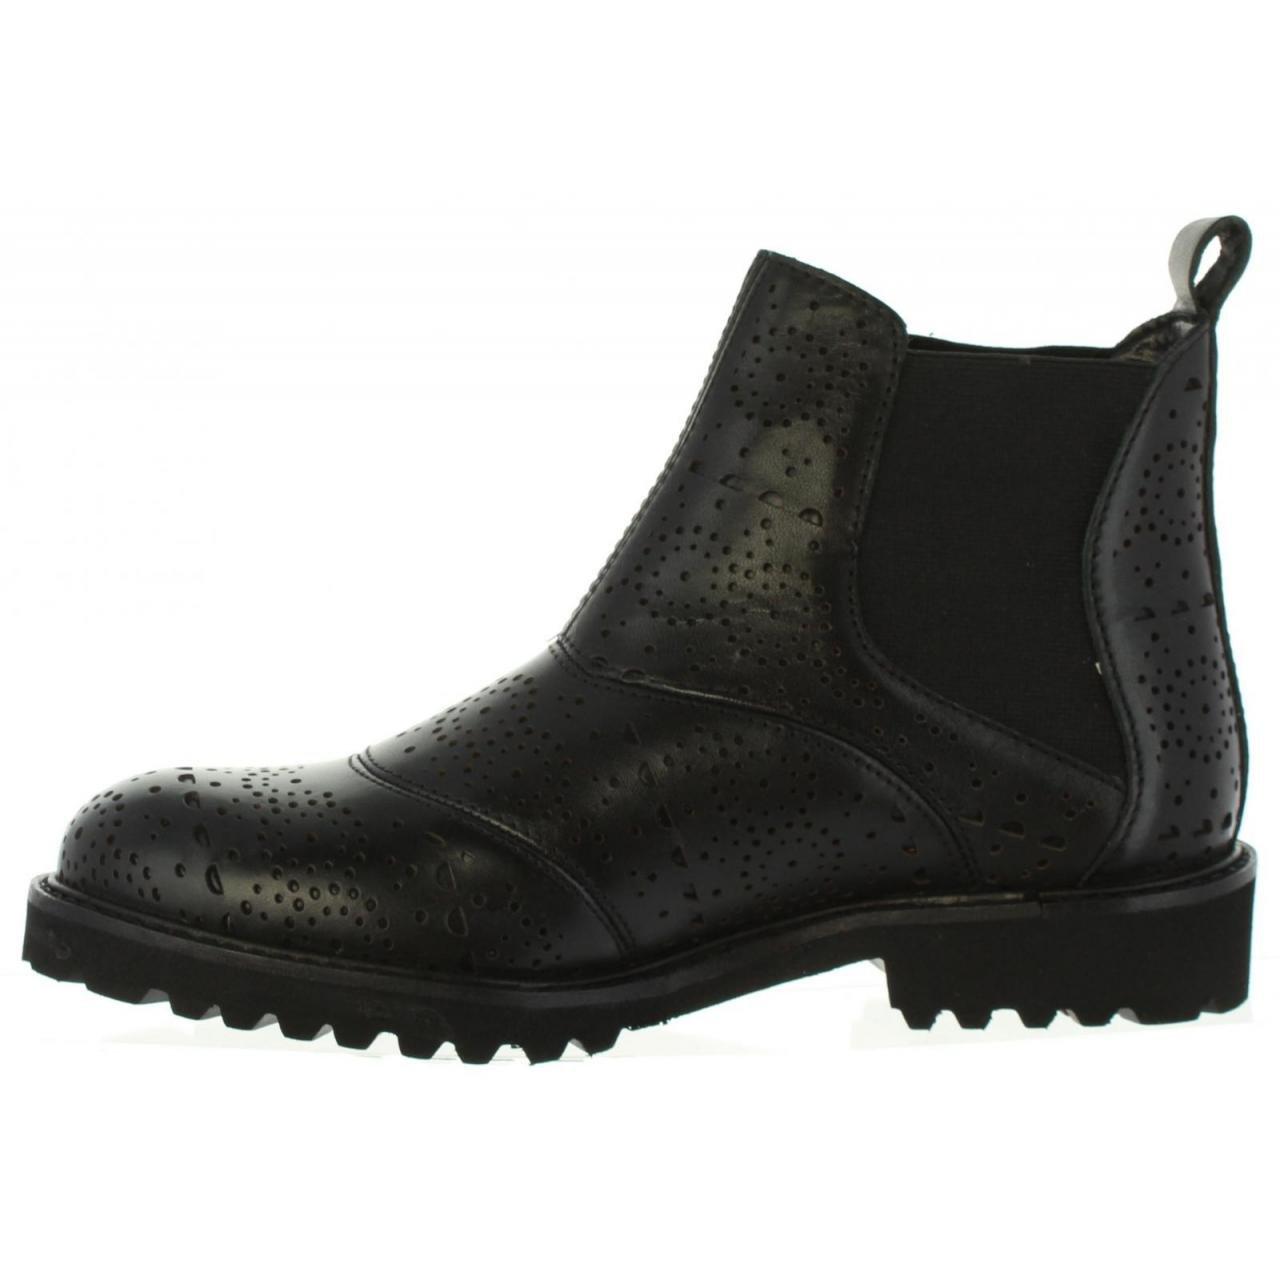 Kickers Kickers Kickers Stiefel für Damen 605860-50 Perce 8 schwarz 8ac370